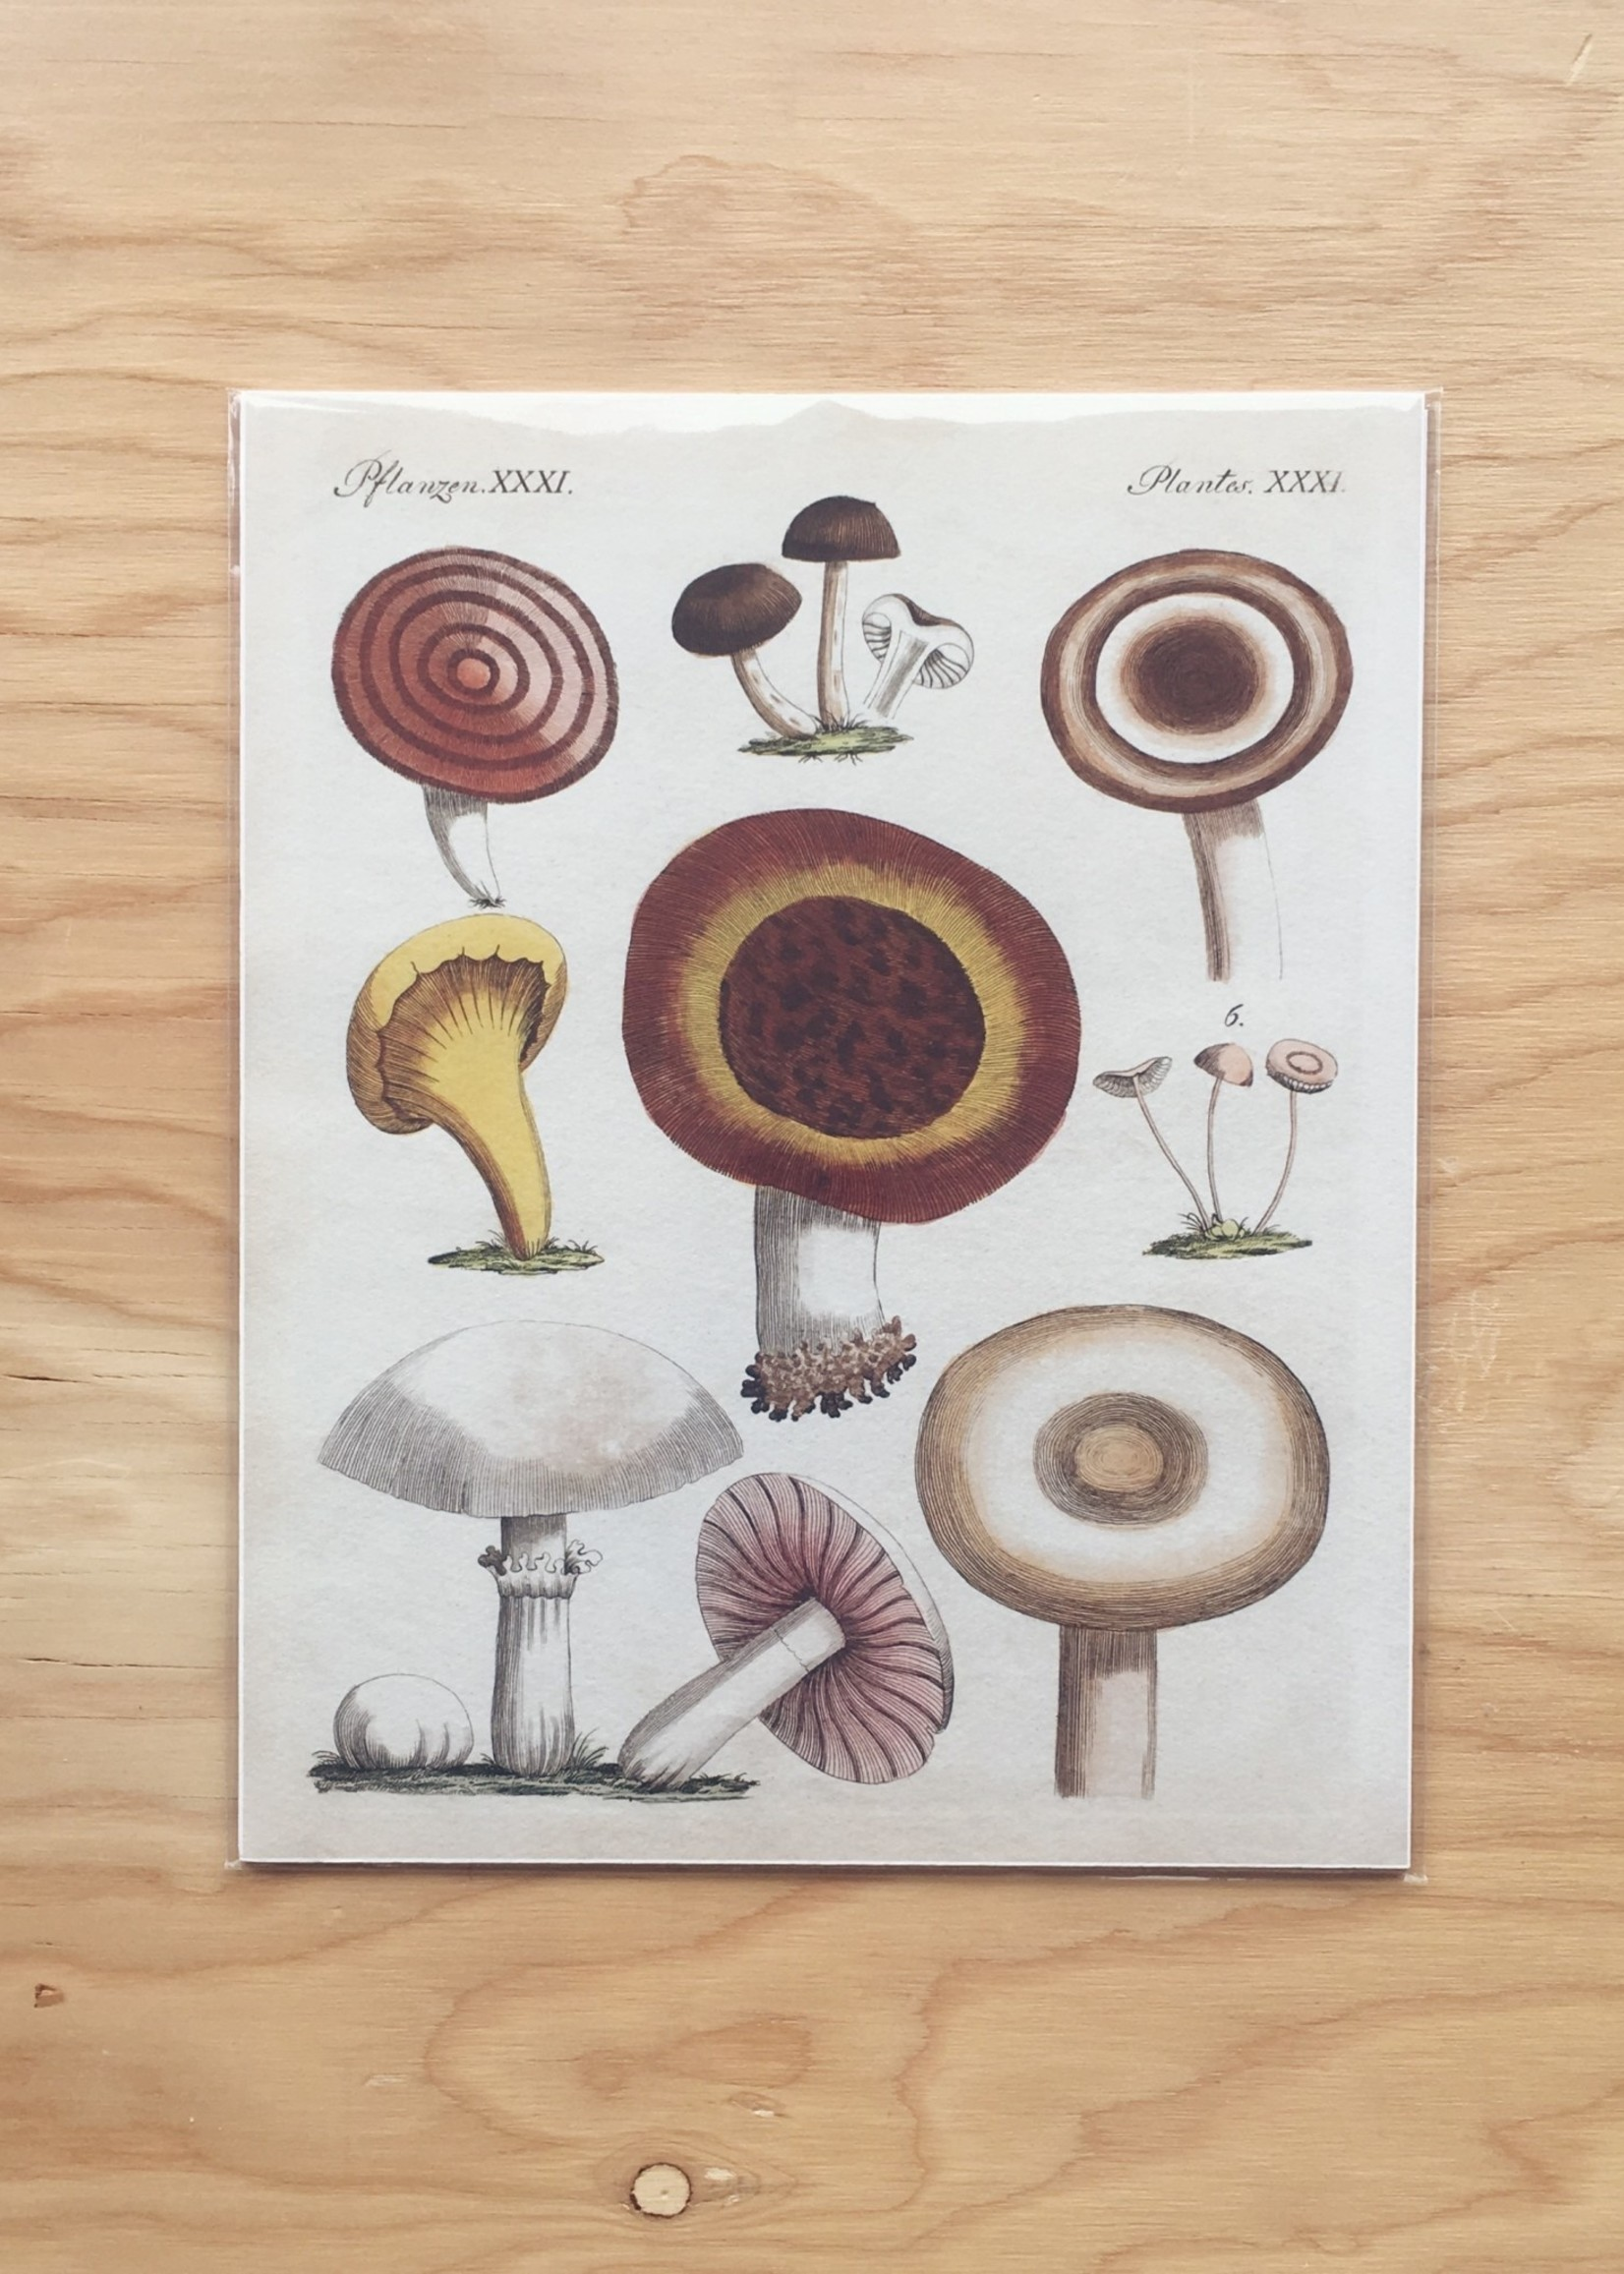 Capricorn Press Affichette de  Capricorn Press - 20cm x 25cm